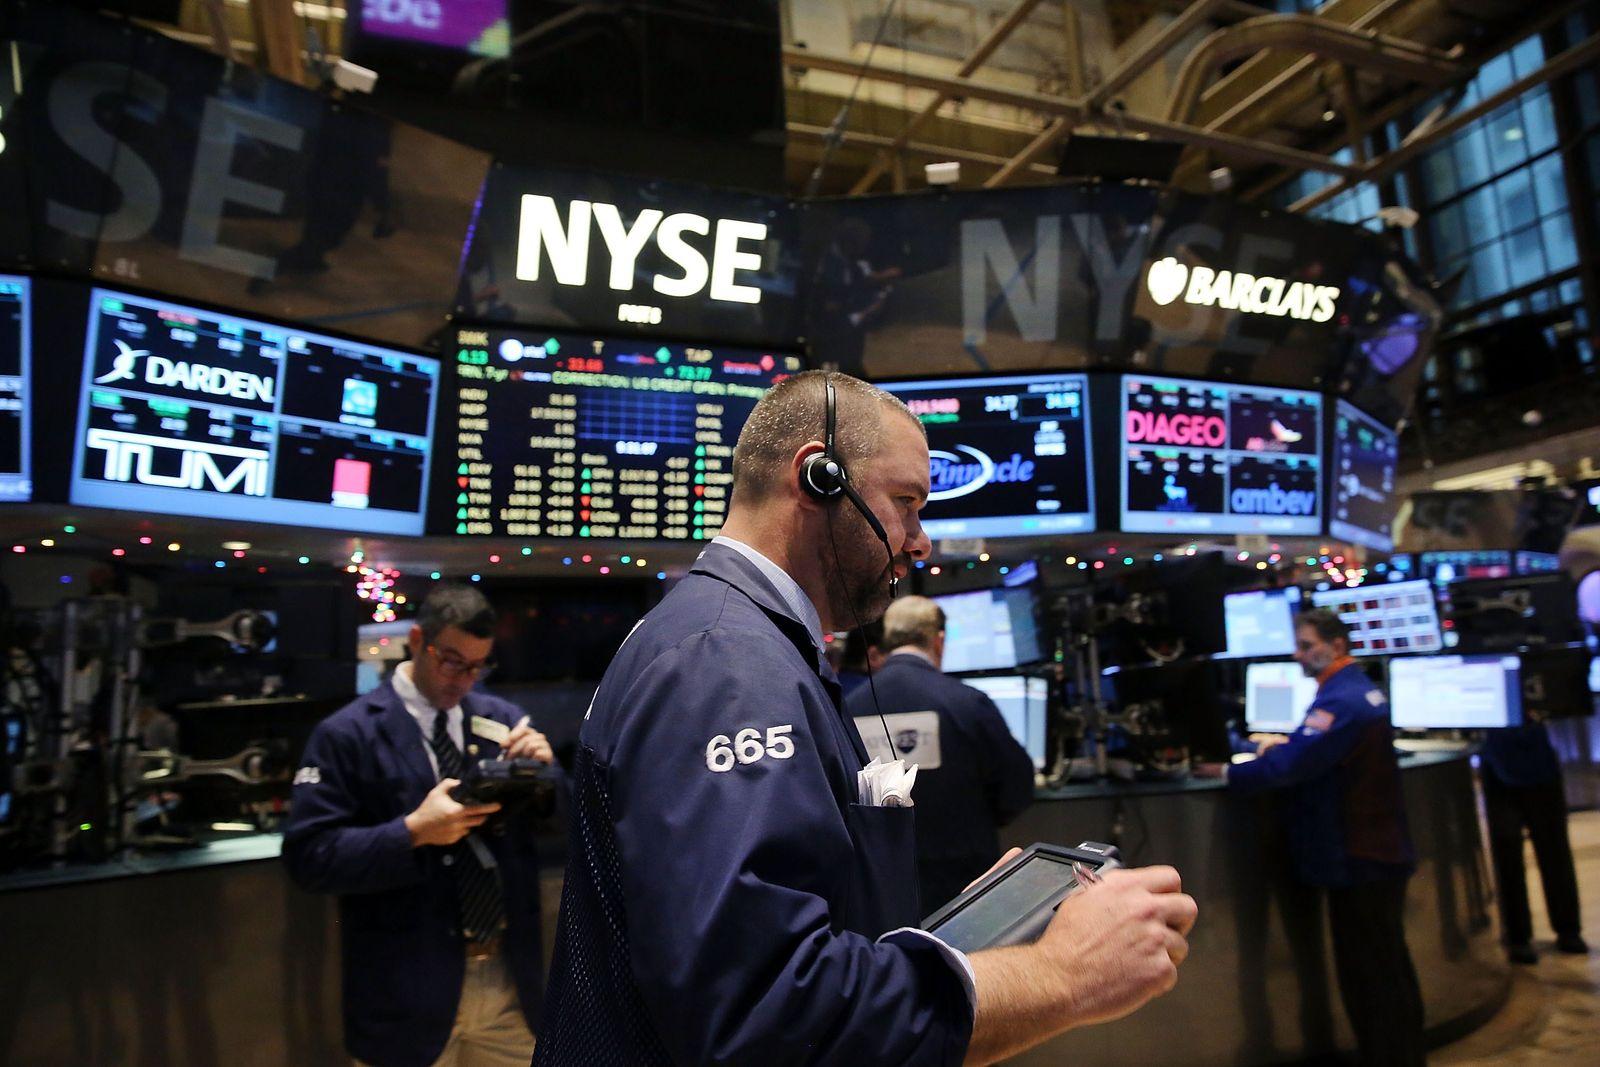 New York Börse NYSE